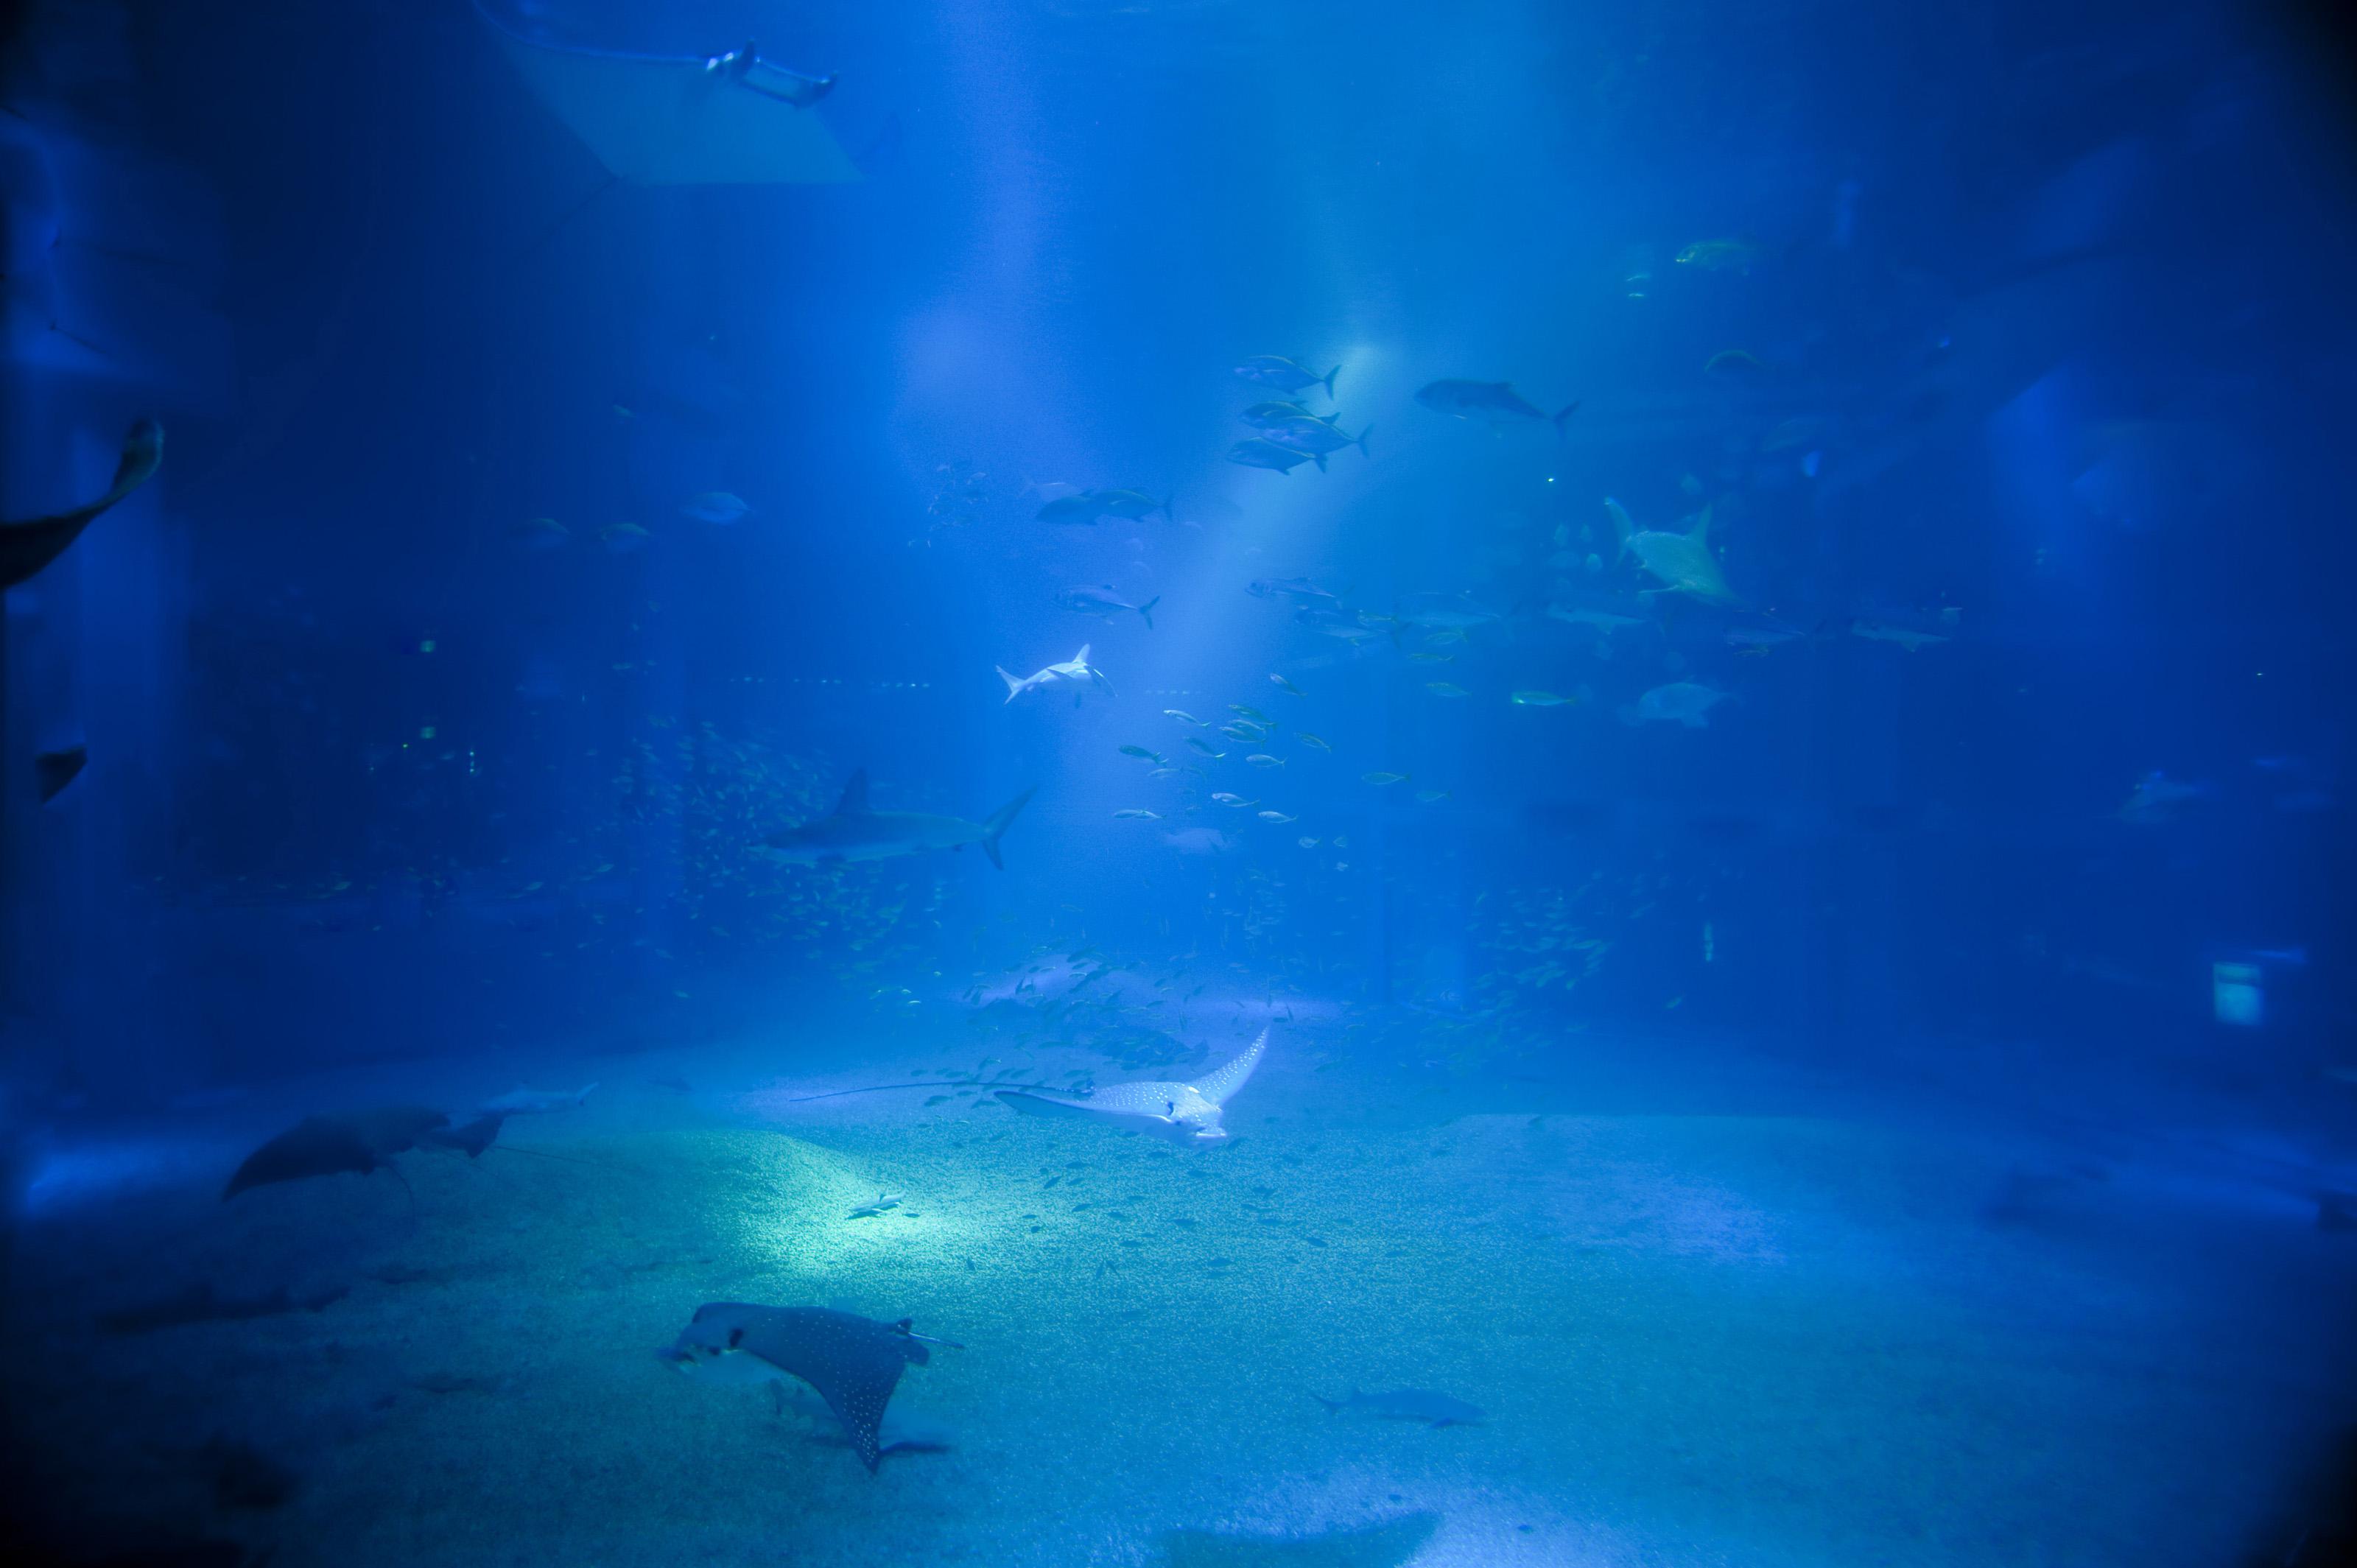 3d Live Moving Wallpaper Deep Blue Sea 6716 Stockarch Free Stock Photos